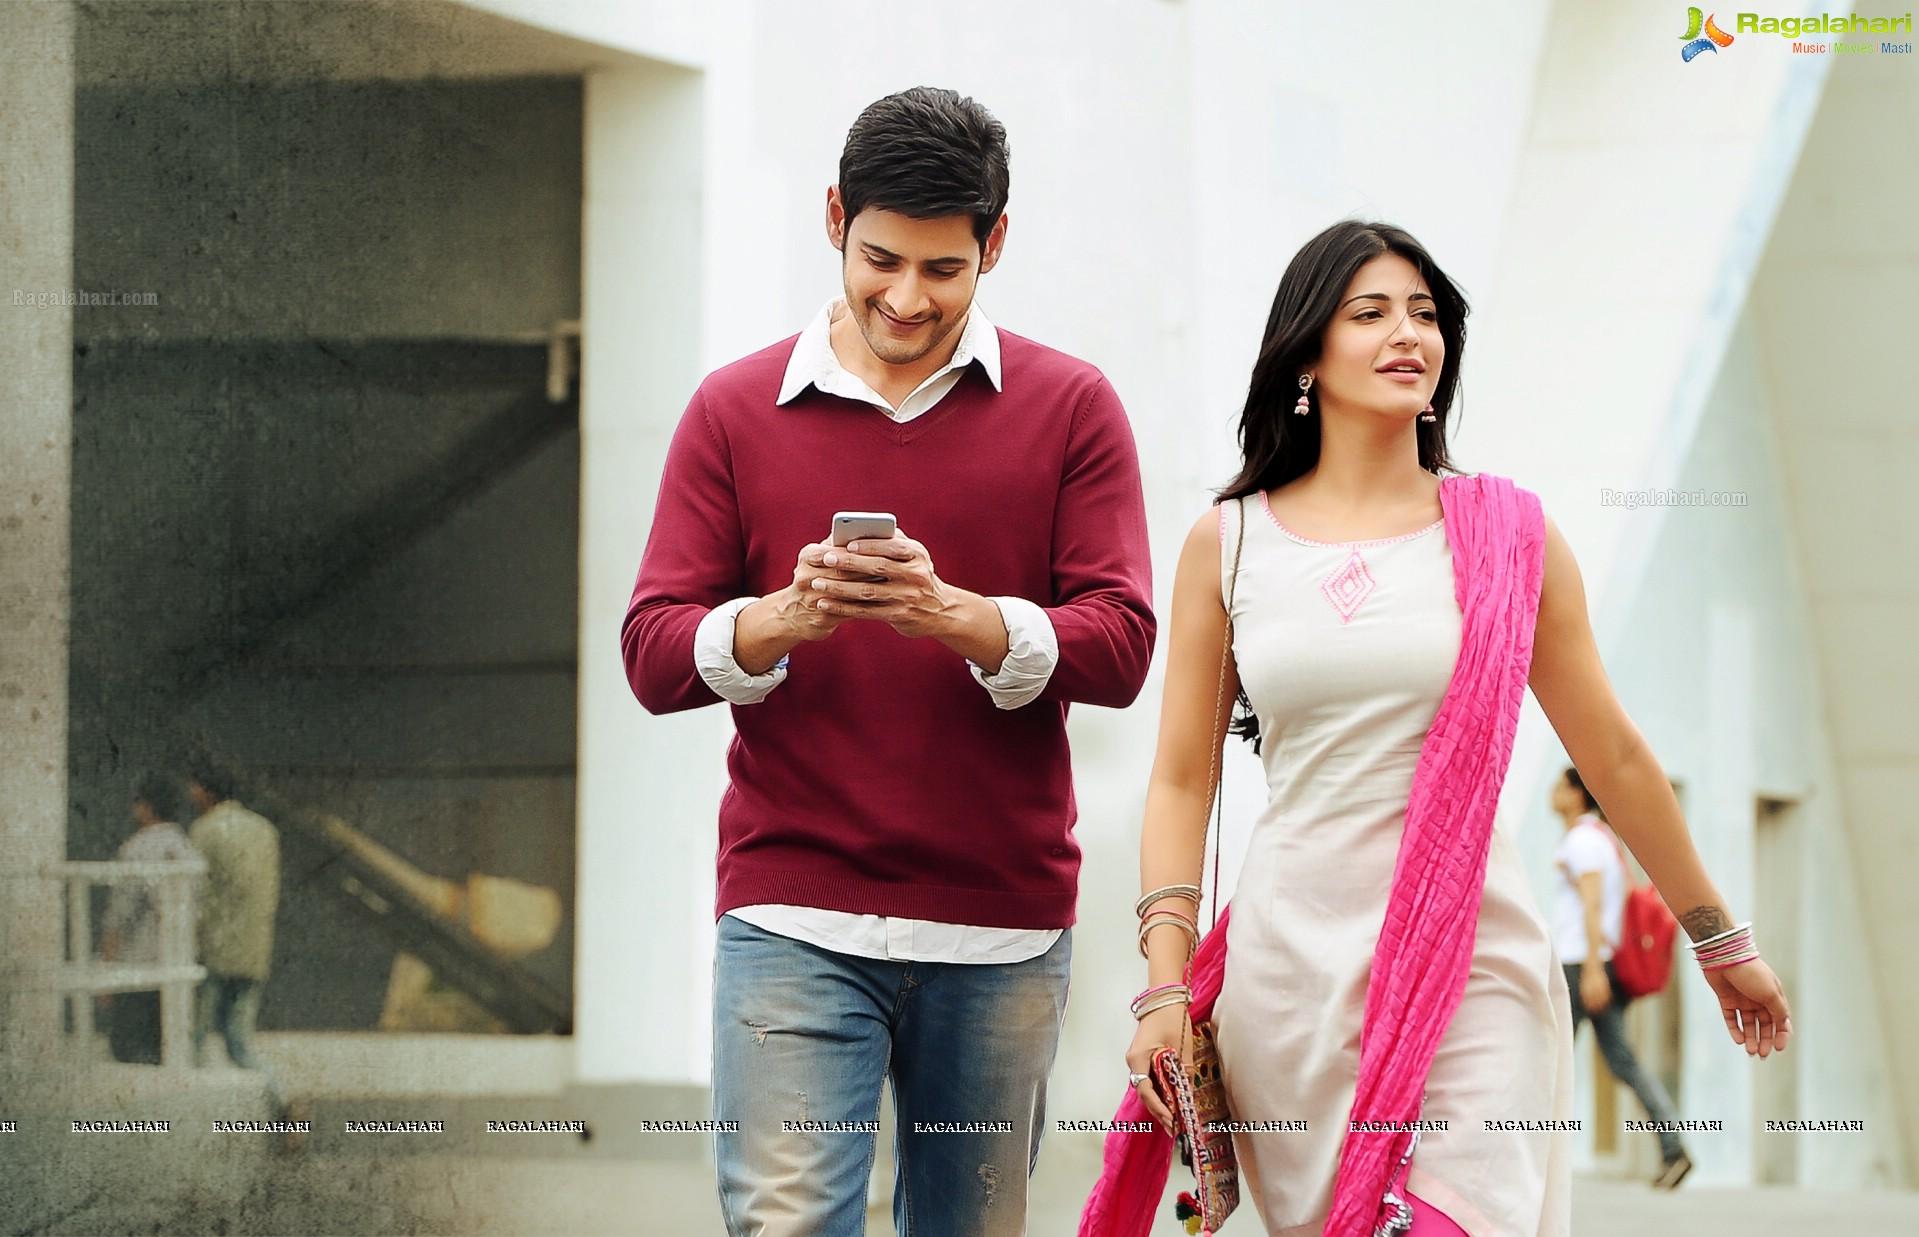 Eros International's Srimanthudu grosses 154 crores in just 25 days!